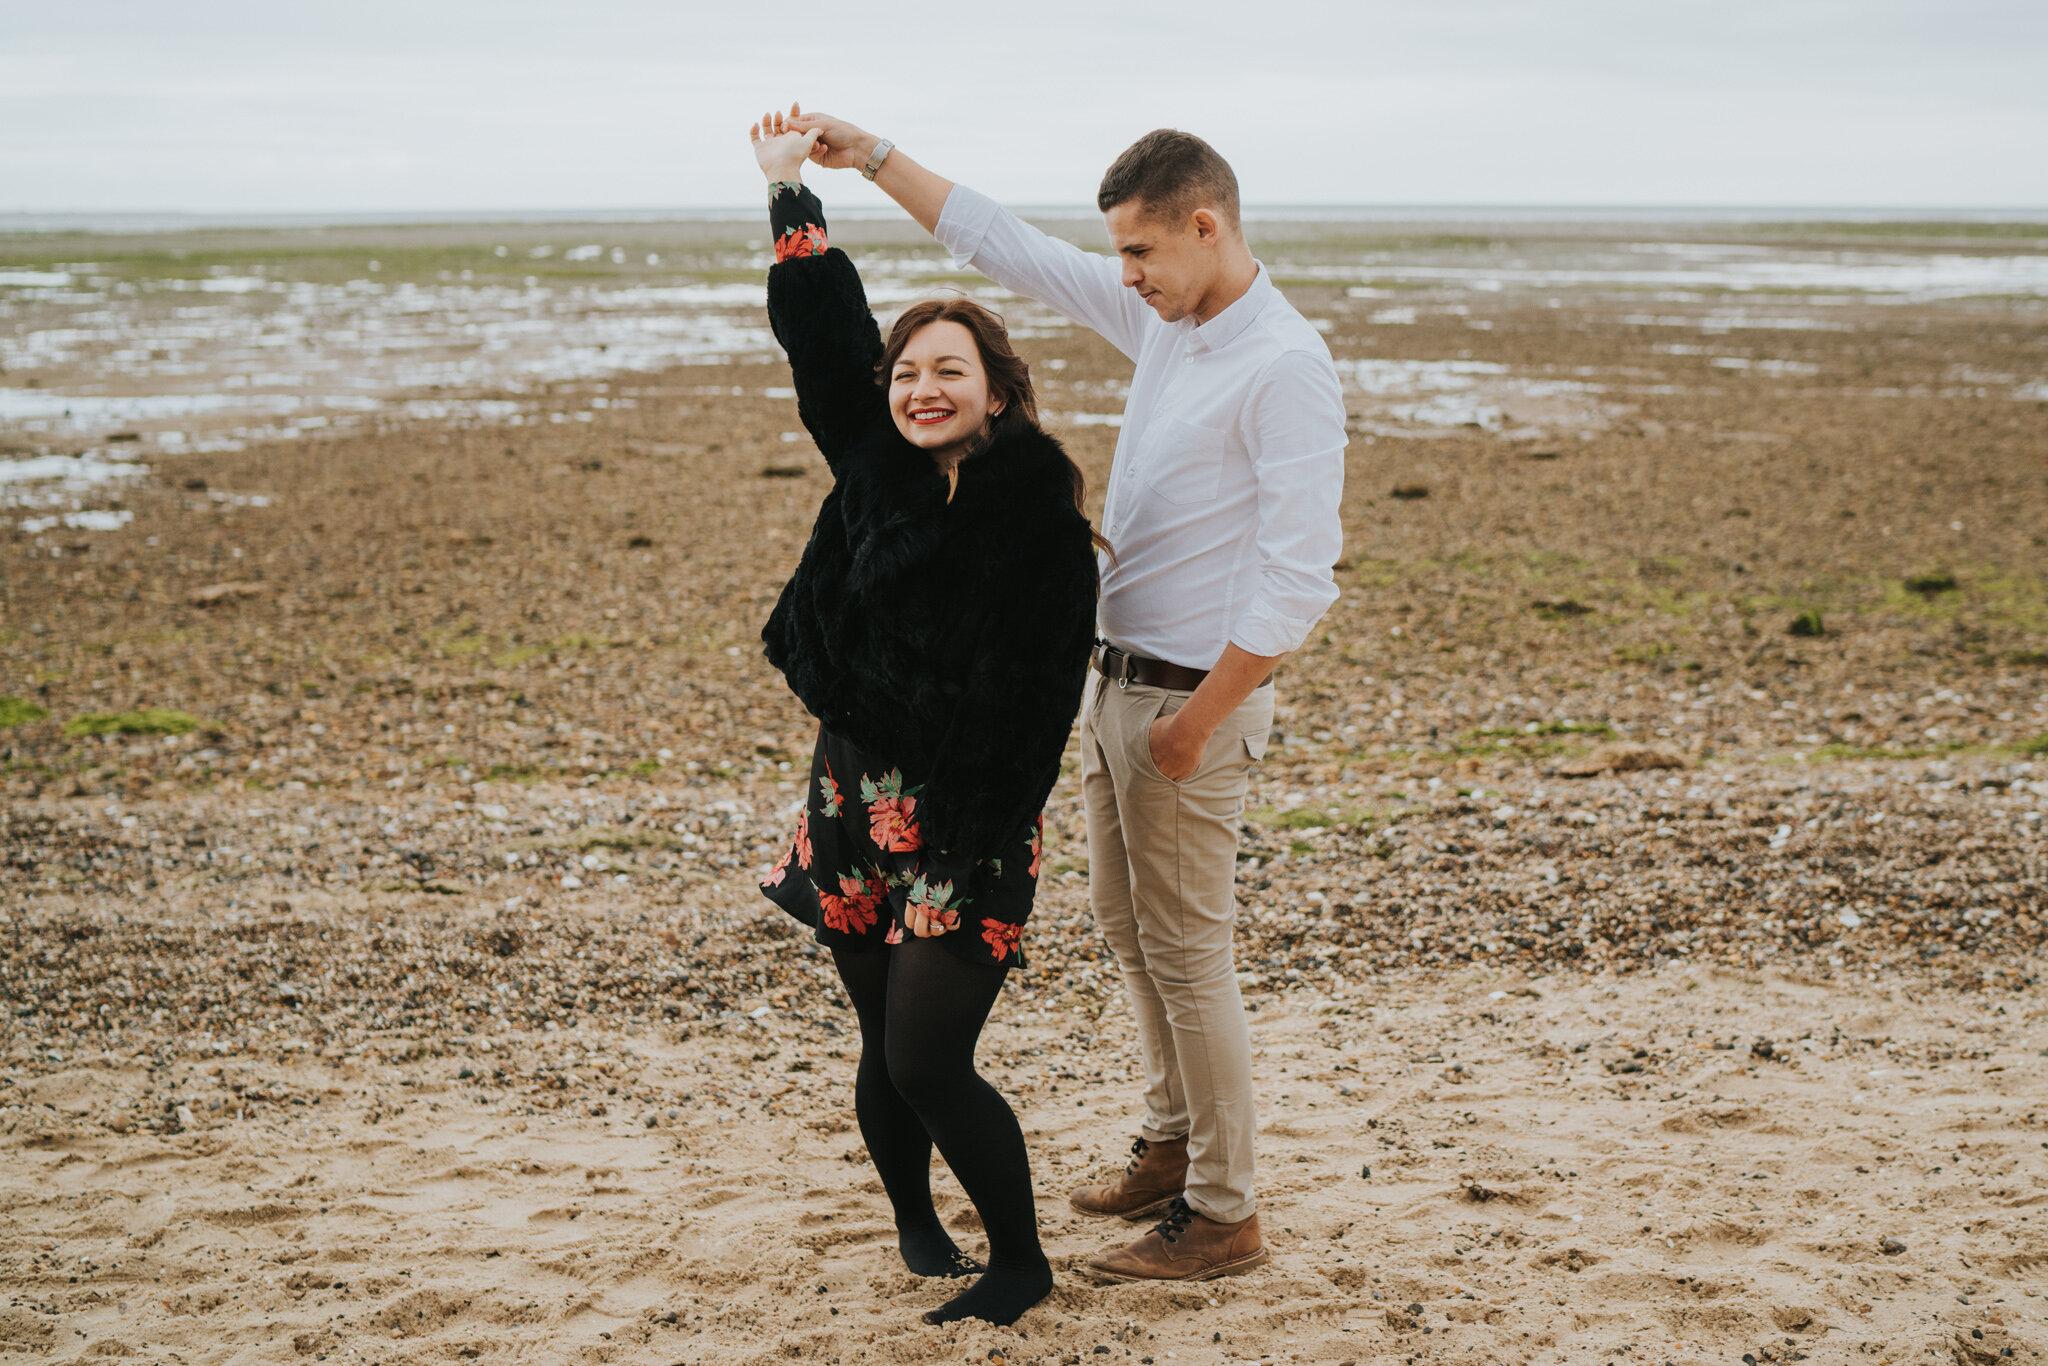 engagement-pre-wedding-hannah-michael-cudmore-grove-east-mersea-grace-elizabeth-colchester-essex-devon-suffolk-and-norfolk-alternative-wedding-and-family-photographer (38 of 51).jpg